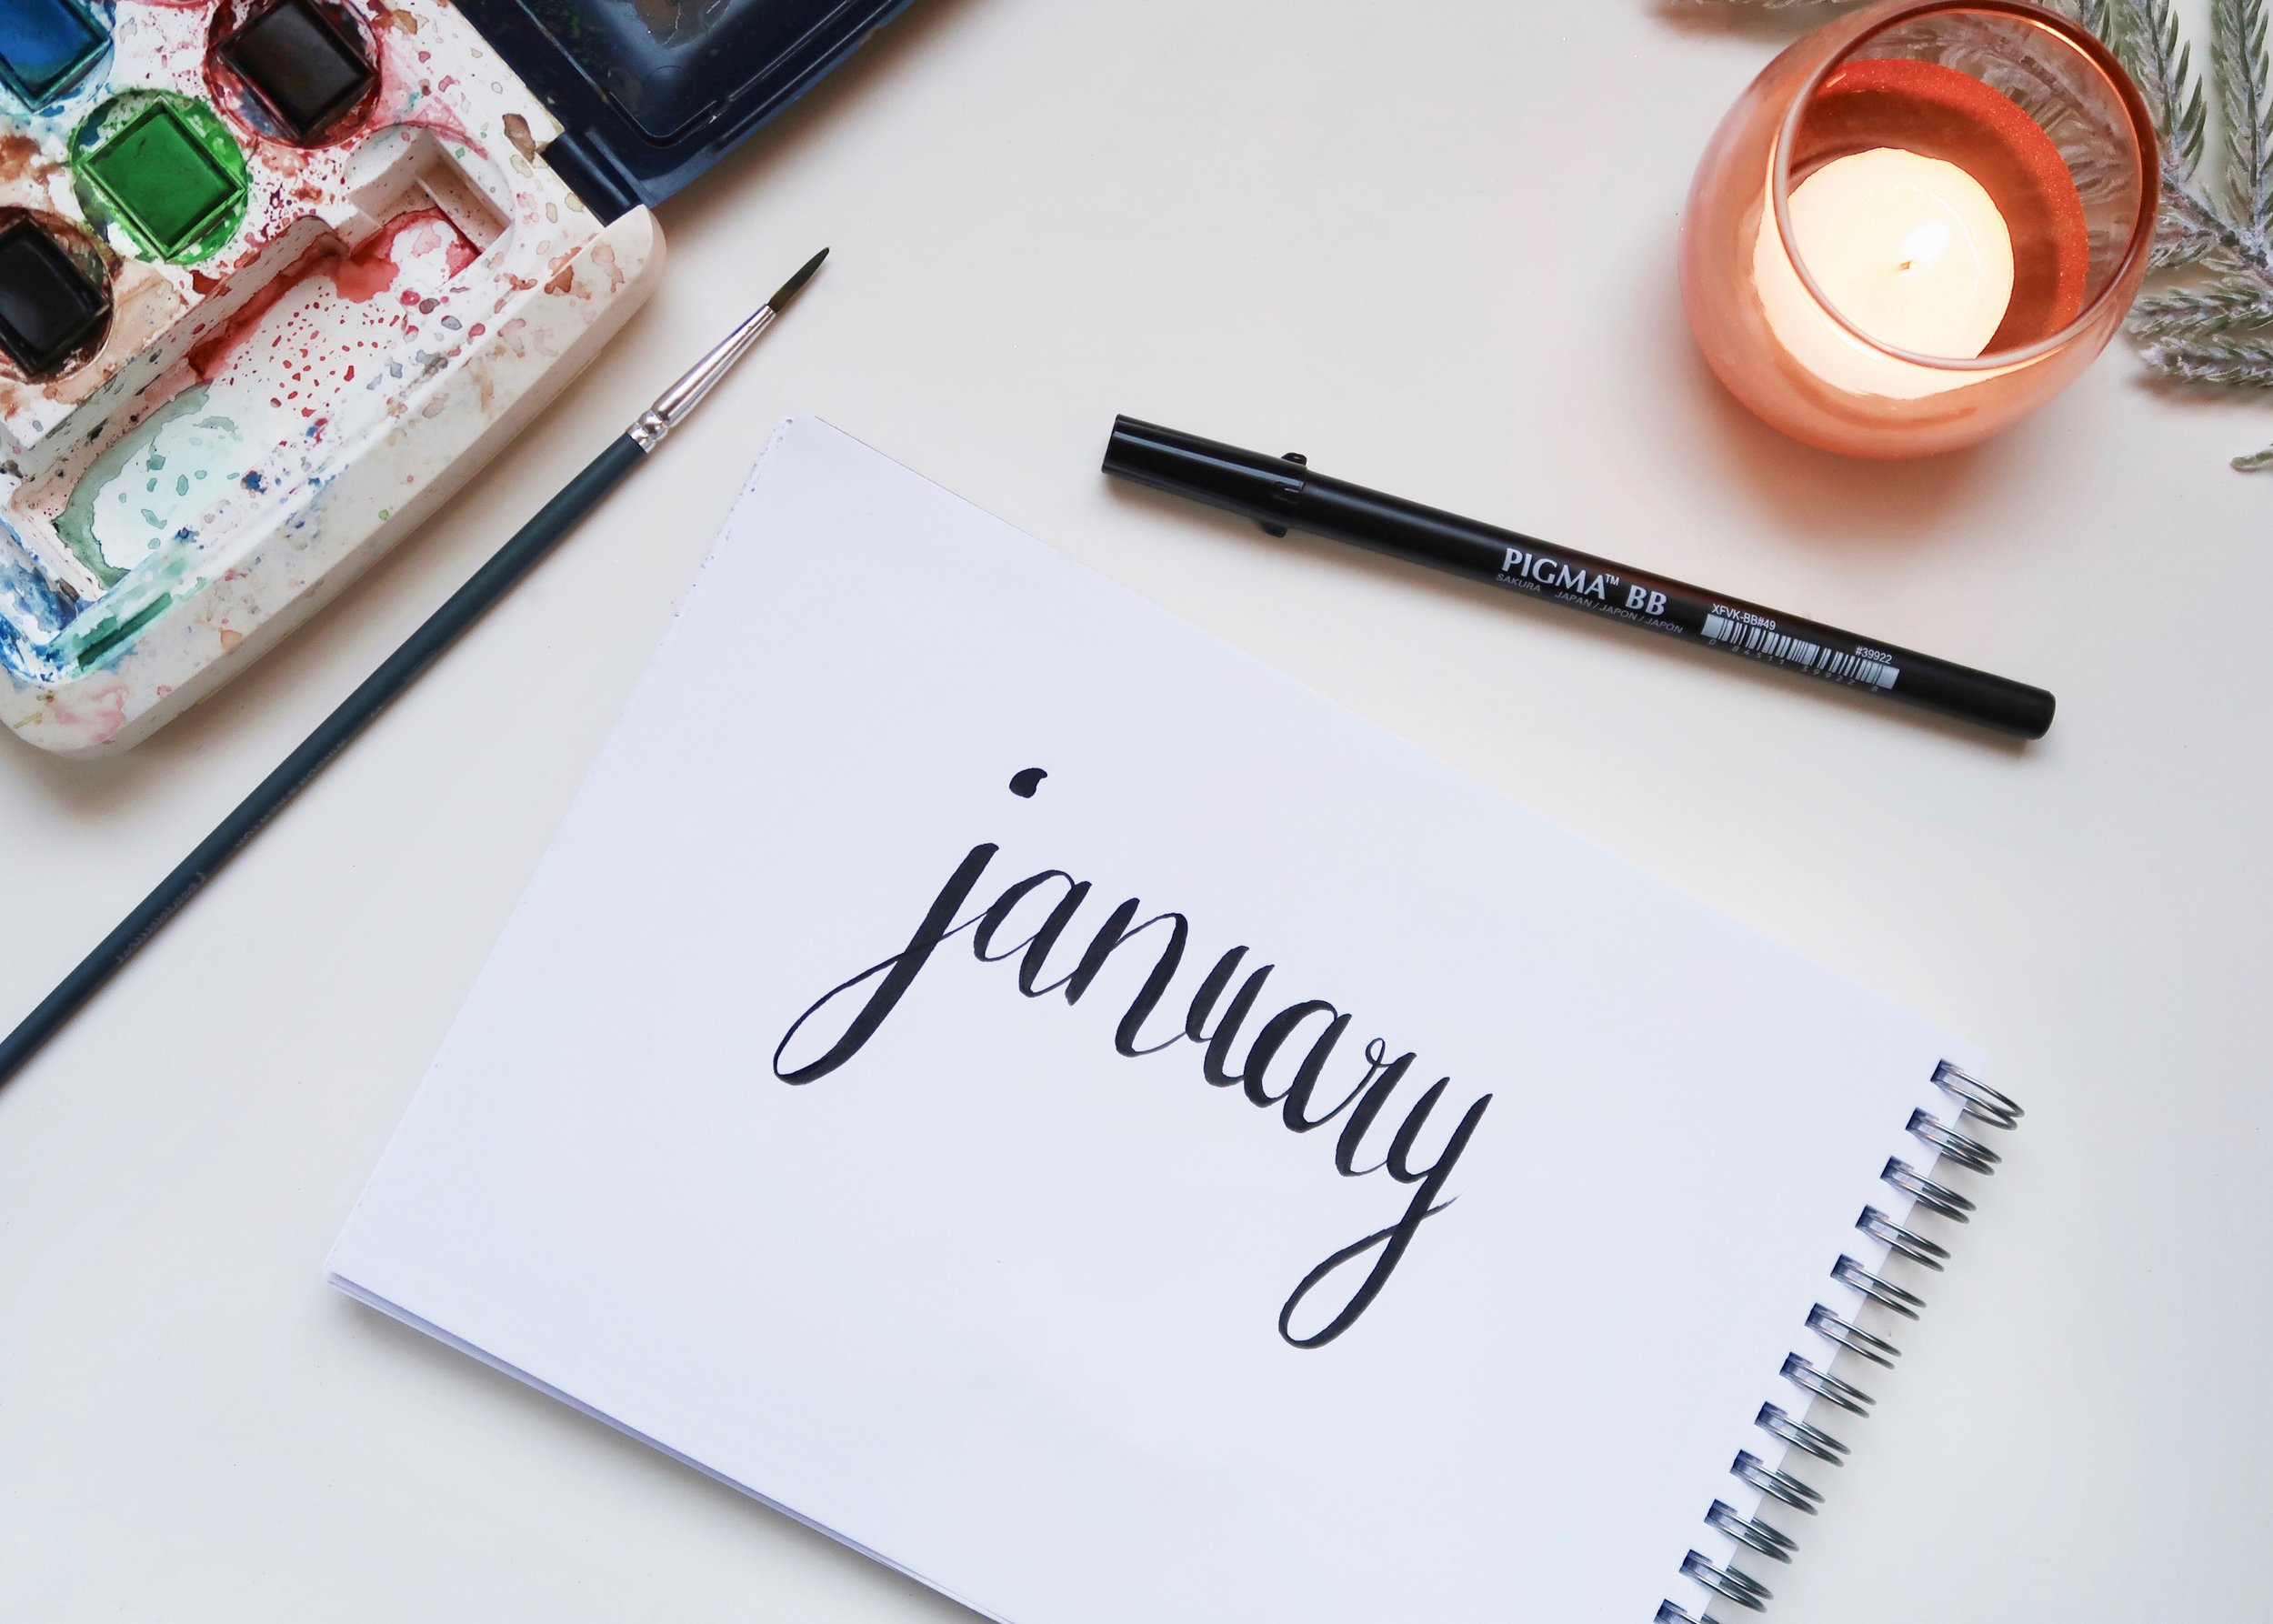 Printable January 2018 Calendar by Isoscella